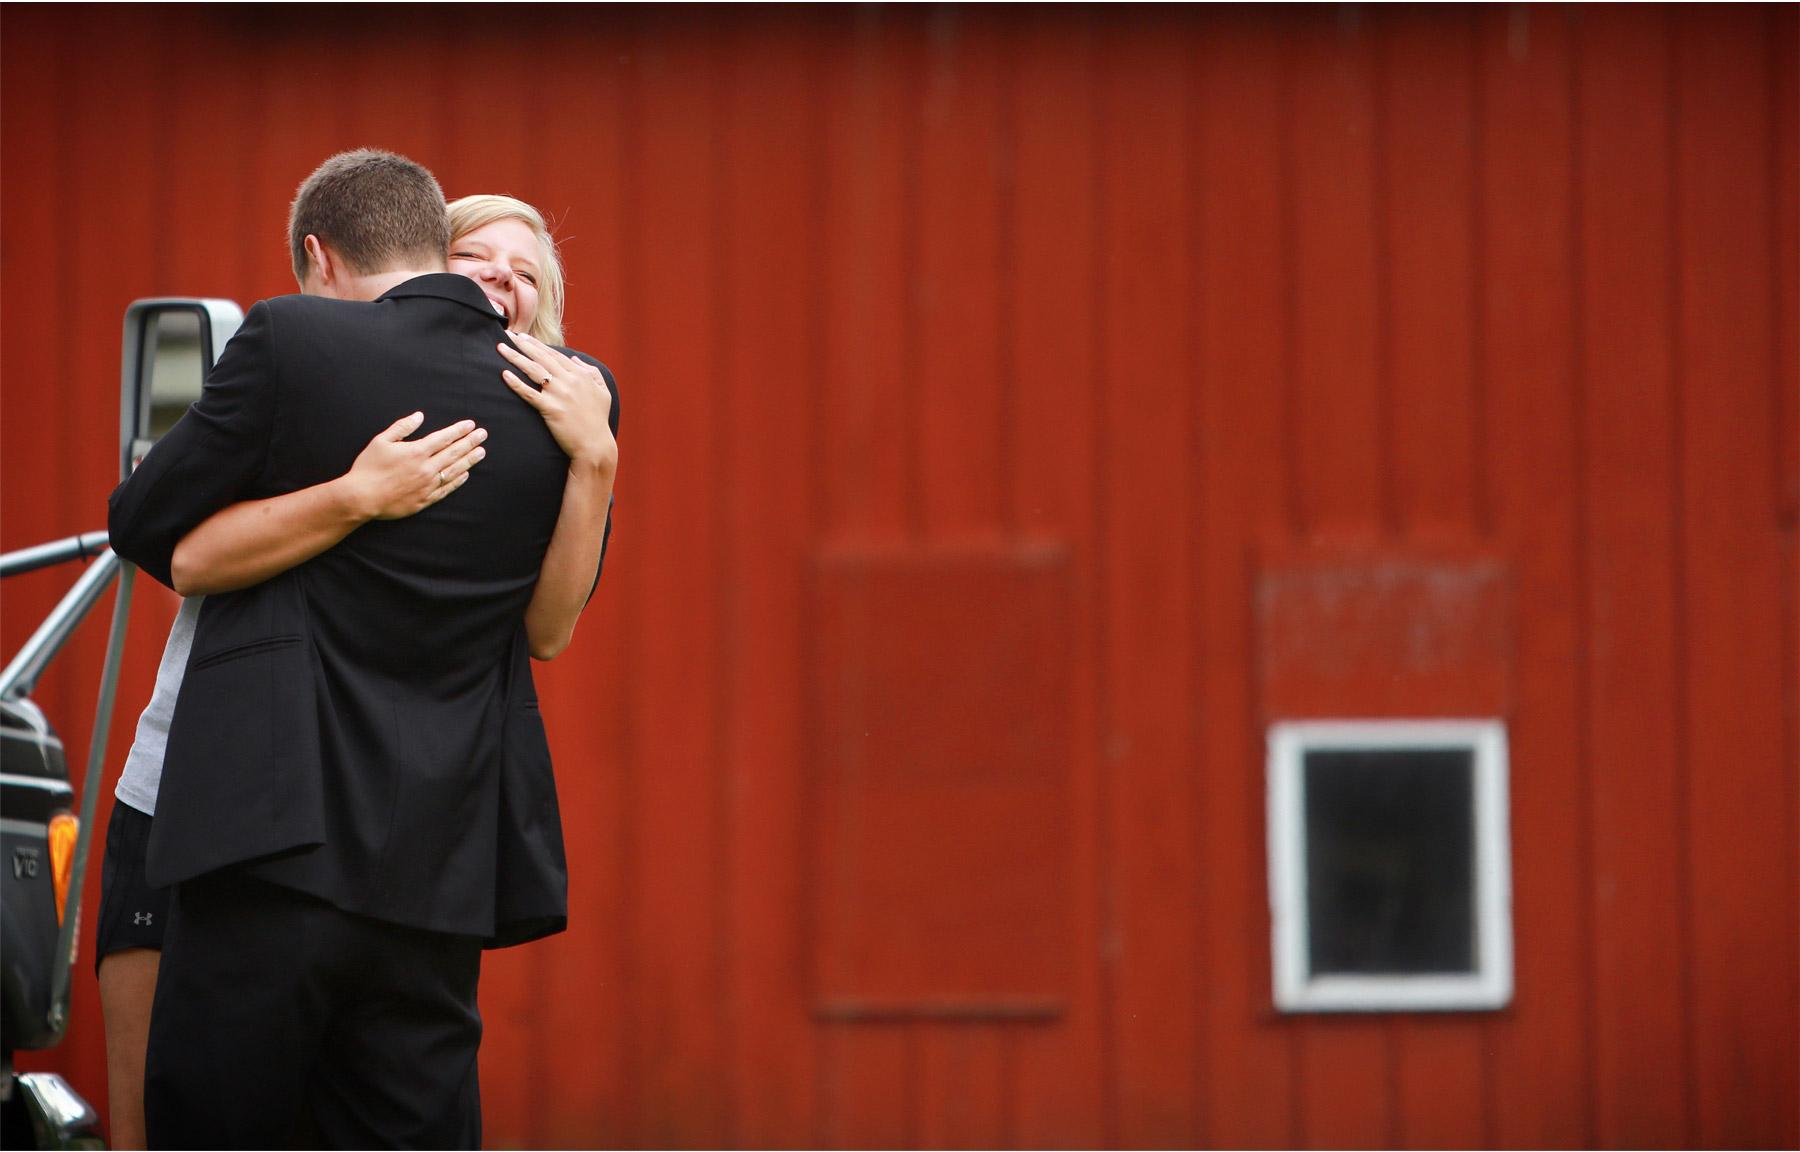 04-Vick-Photography-Proposal-Session-Engagement-Family-Farm-Hug-Kasie-and-Josh.jpg